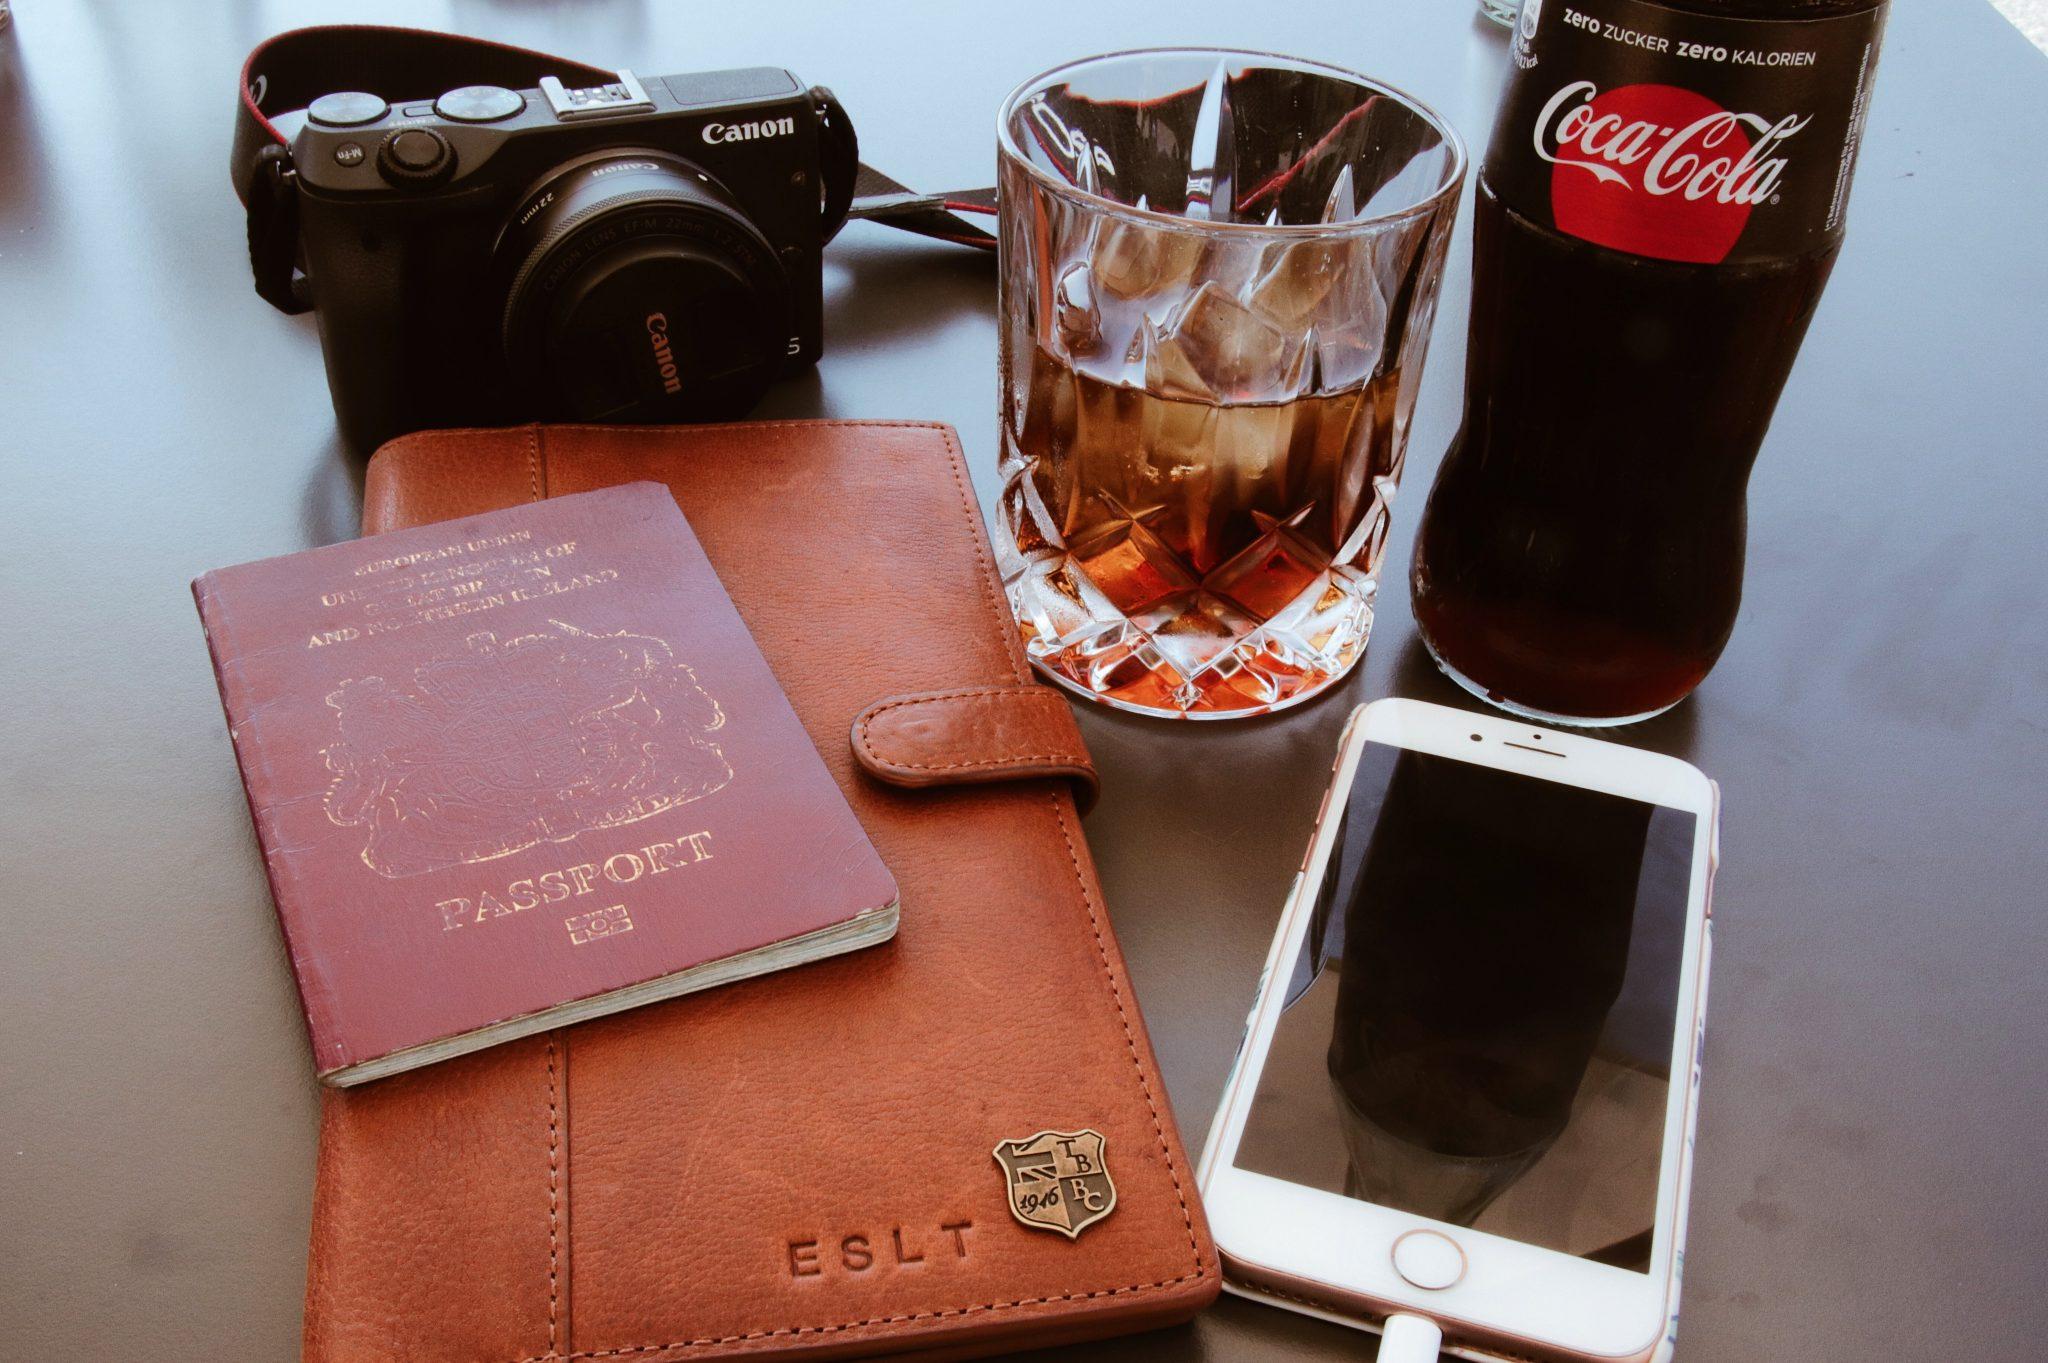 Travel Document Holder from British Belt Company